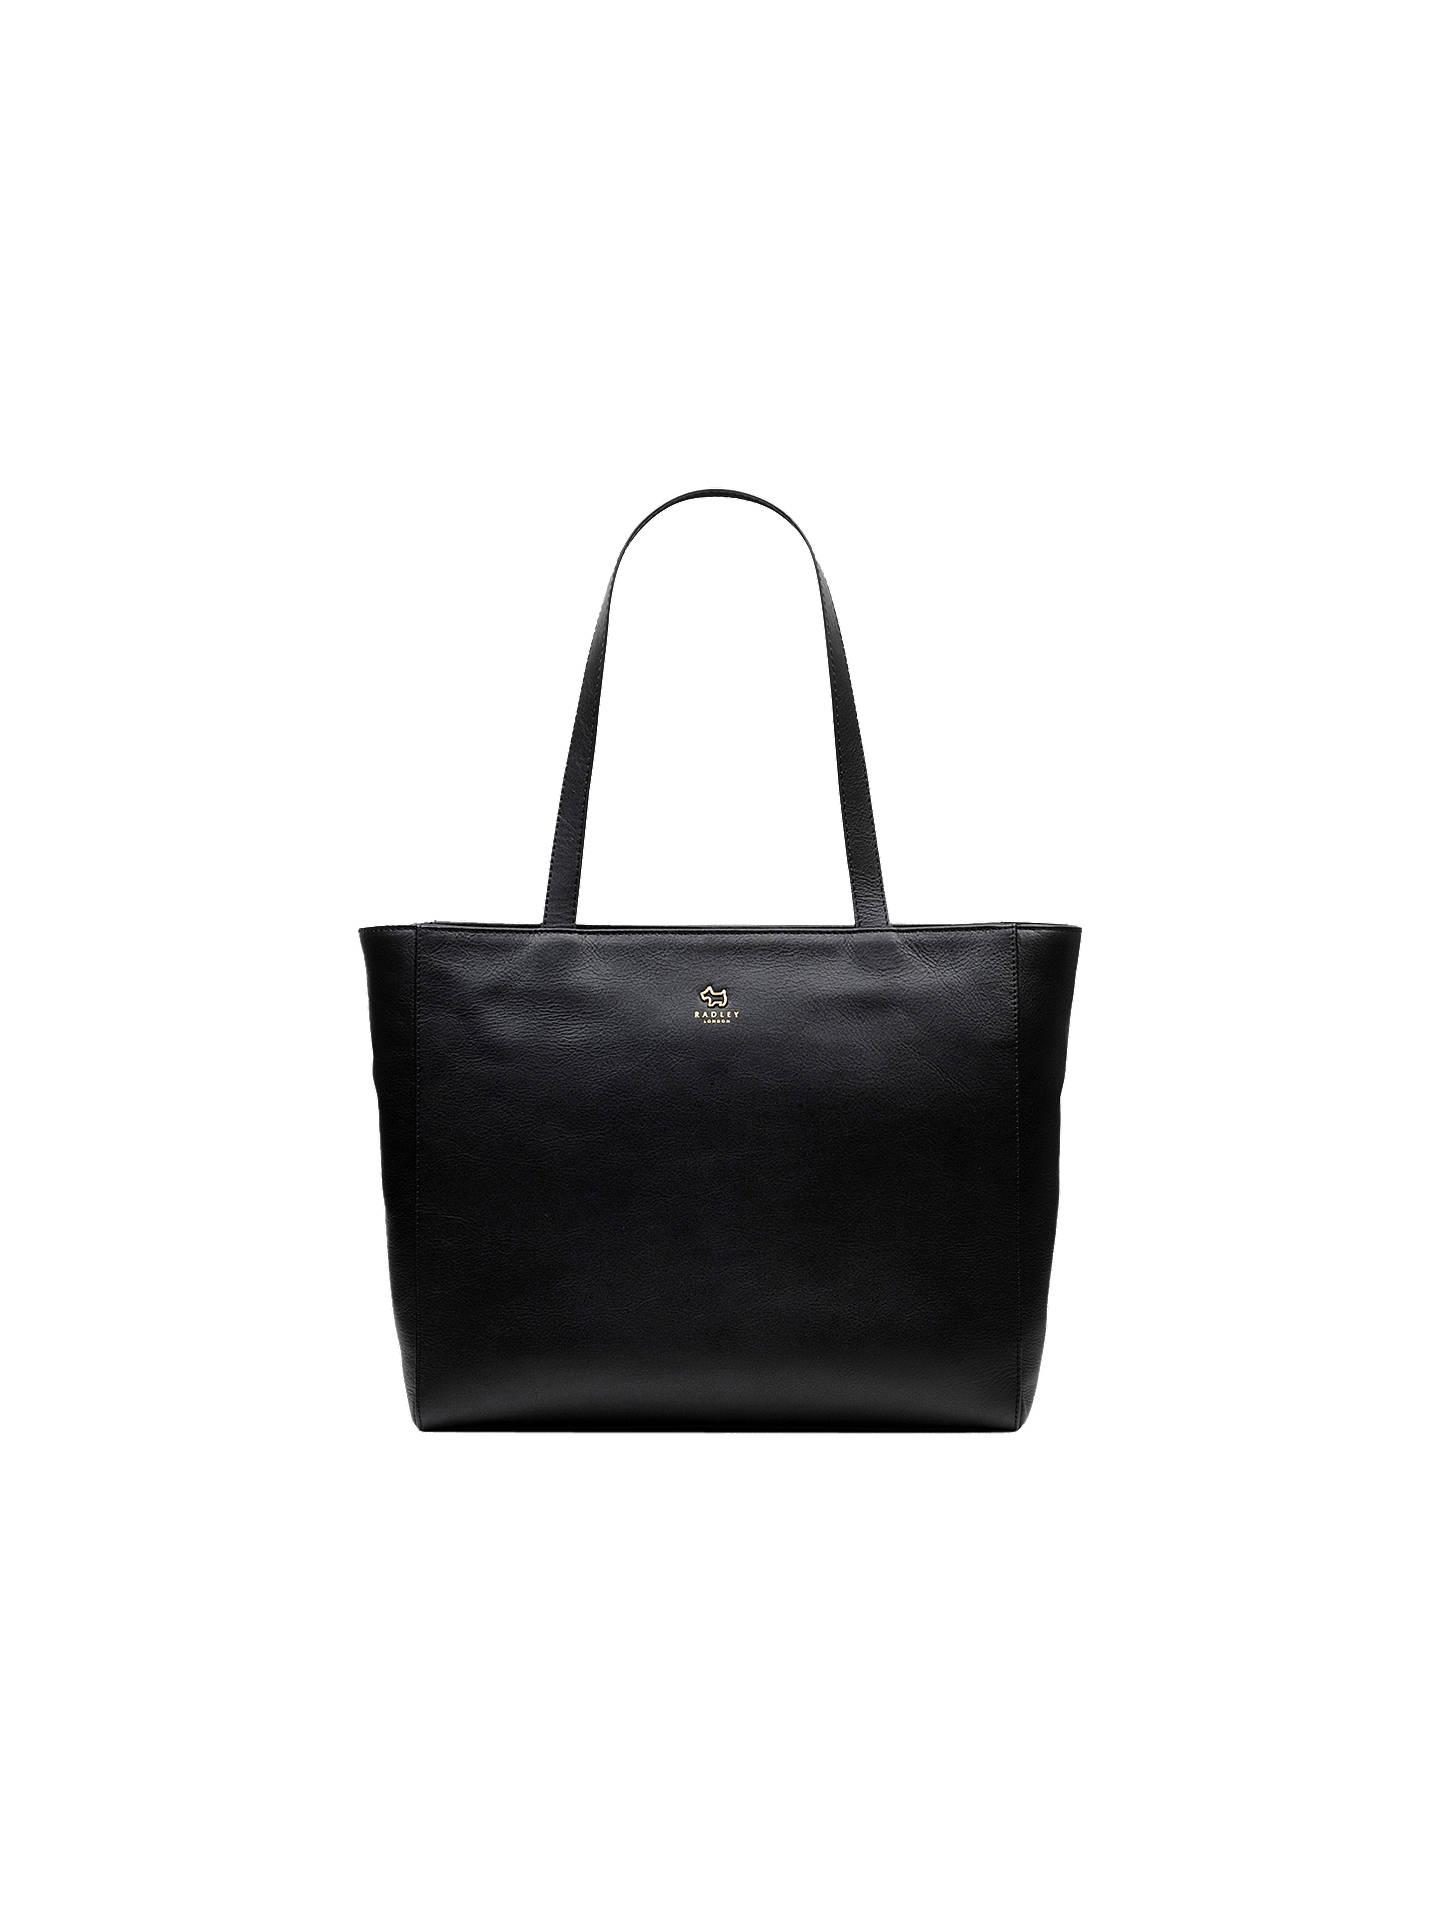 Radley Greyfriars Gardens Leather Large Tote Bag Black Online At Johnlewis